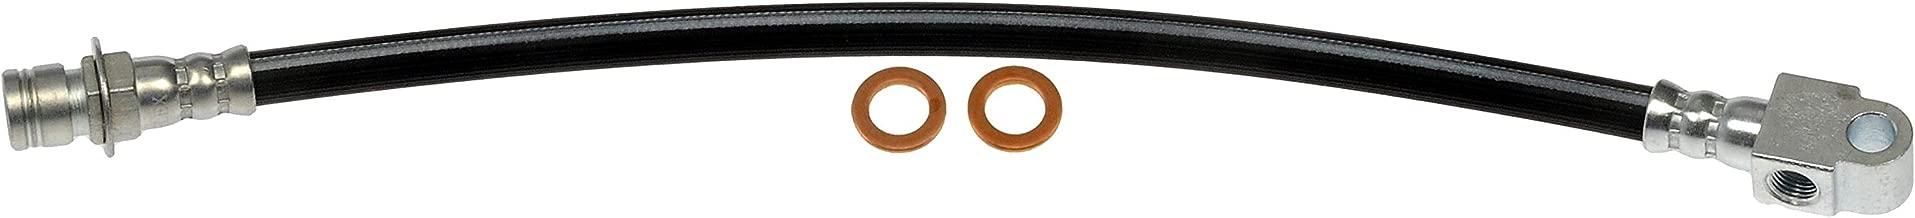 Dorman H71374 Hydraulic Brake Hose